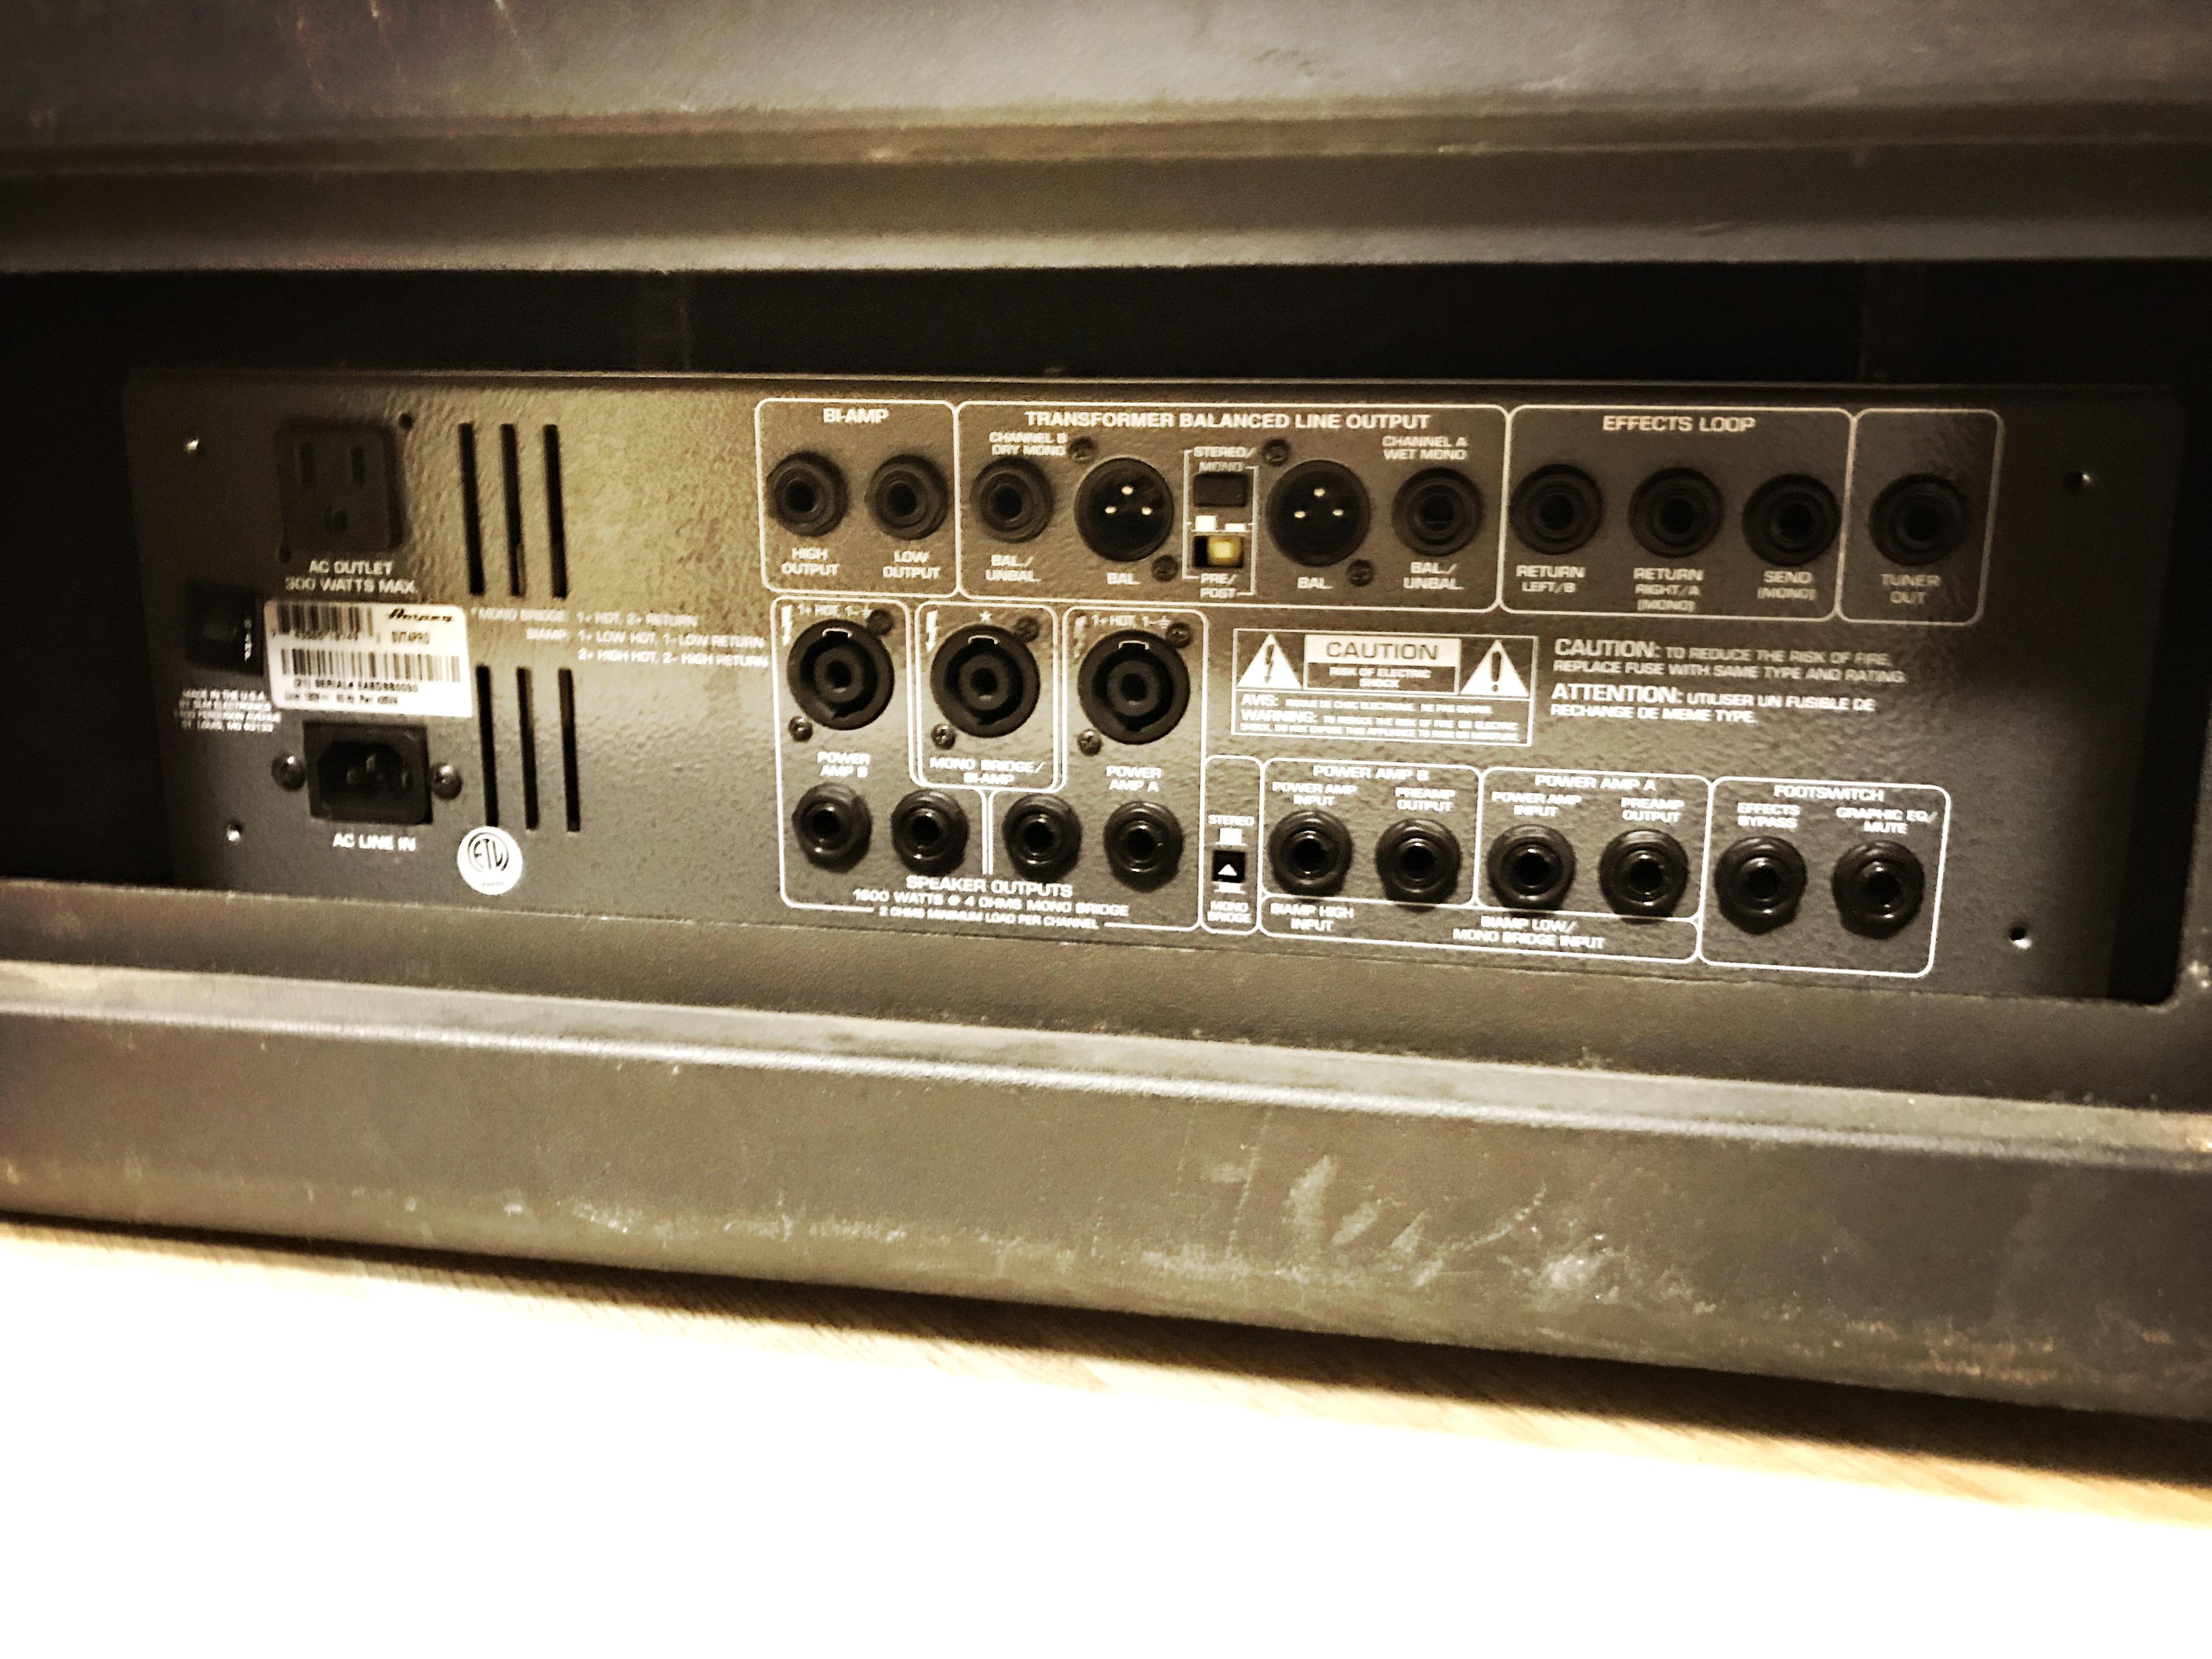 Ampeg Svt 4 pro Manual Repair no sound